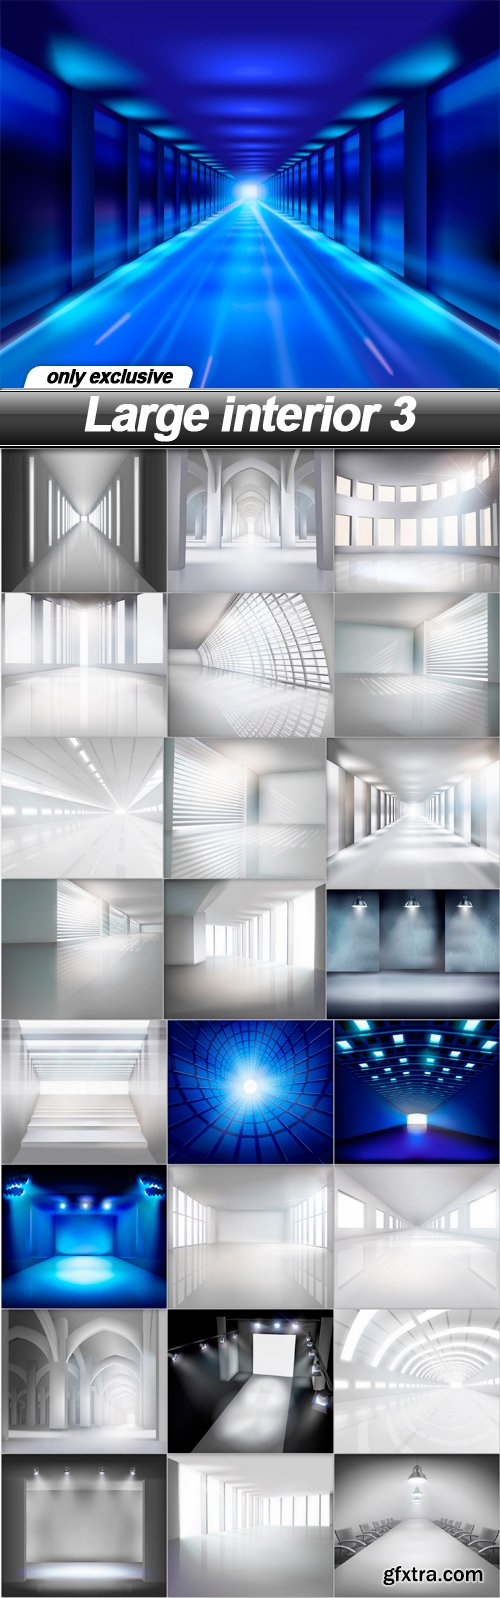 Large interior 3 - 25 UHQ JPEG